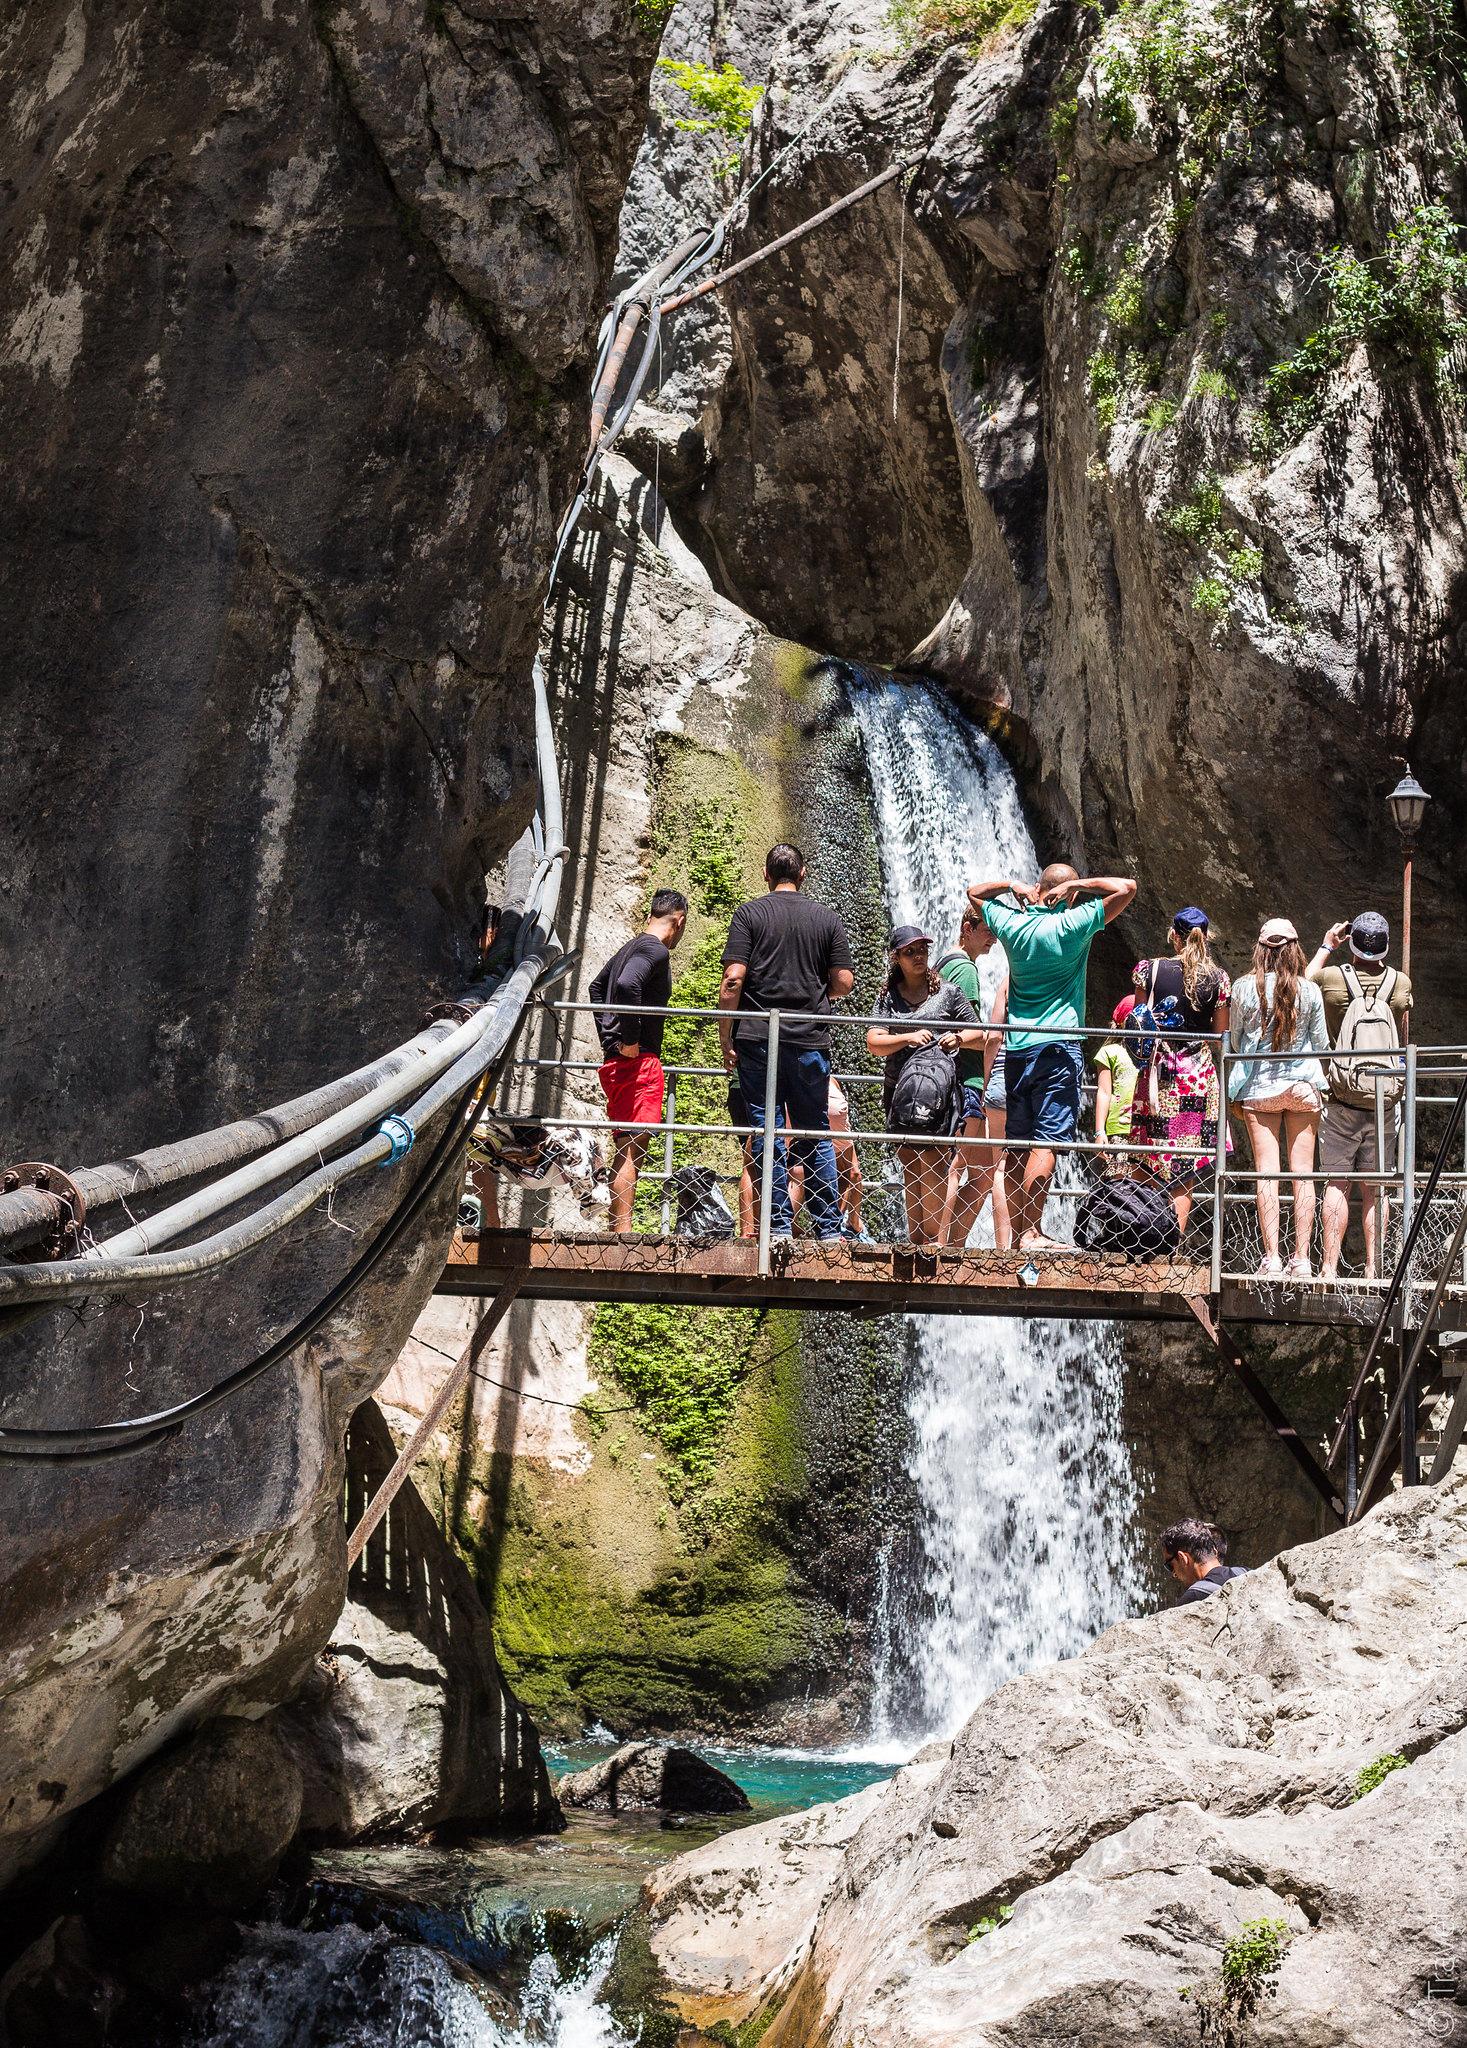 Sapadere-Canyon-Tour-экскурсия-в-каньон-сападере-6249